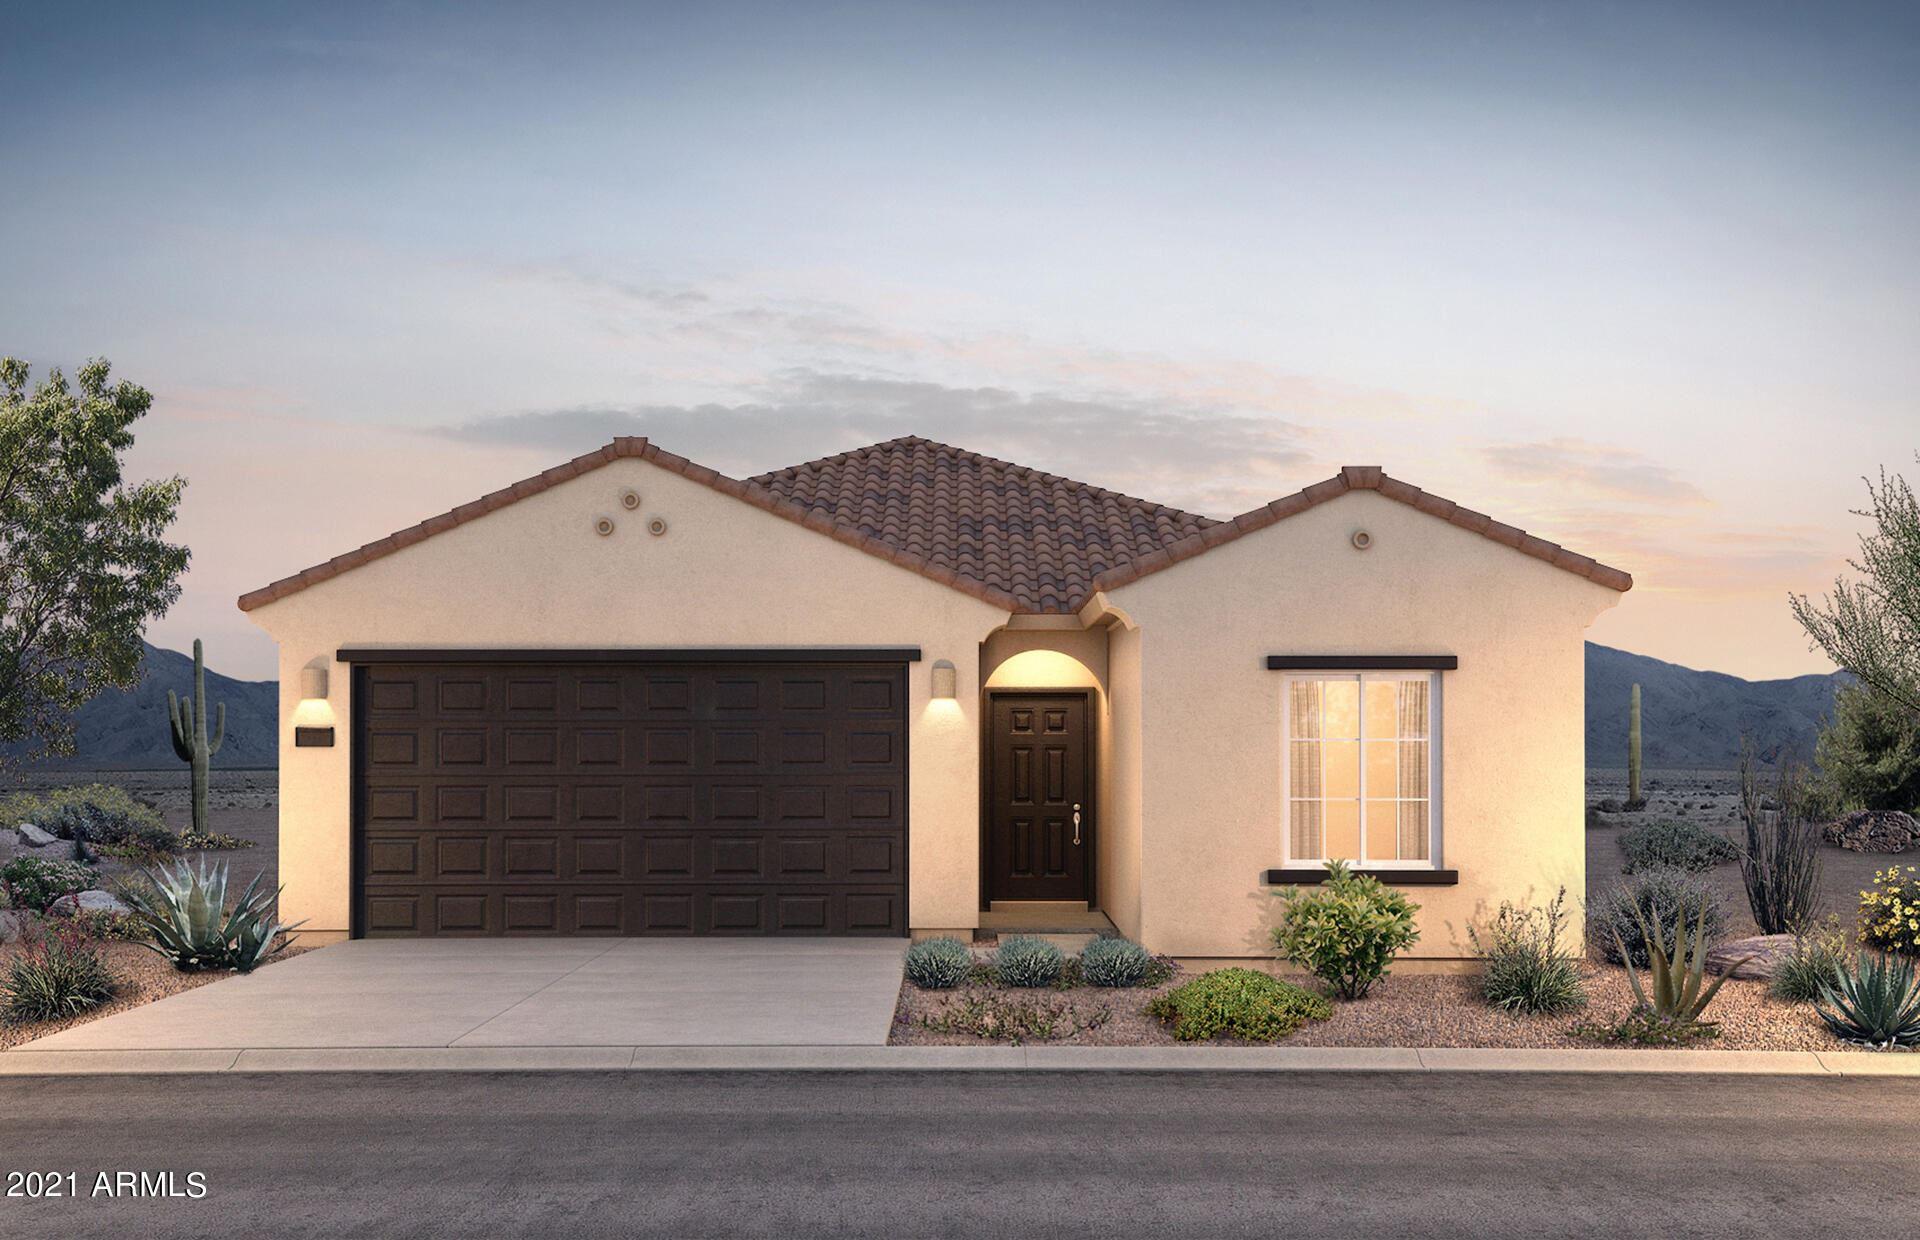 Photo for 18513 N LAKESIDE Drive, Maricopa, AZ 85138 (MLS # 6290454)